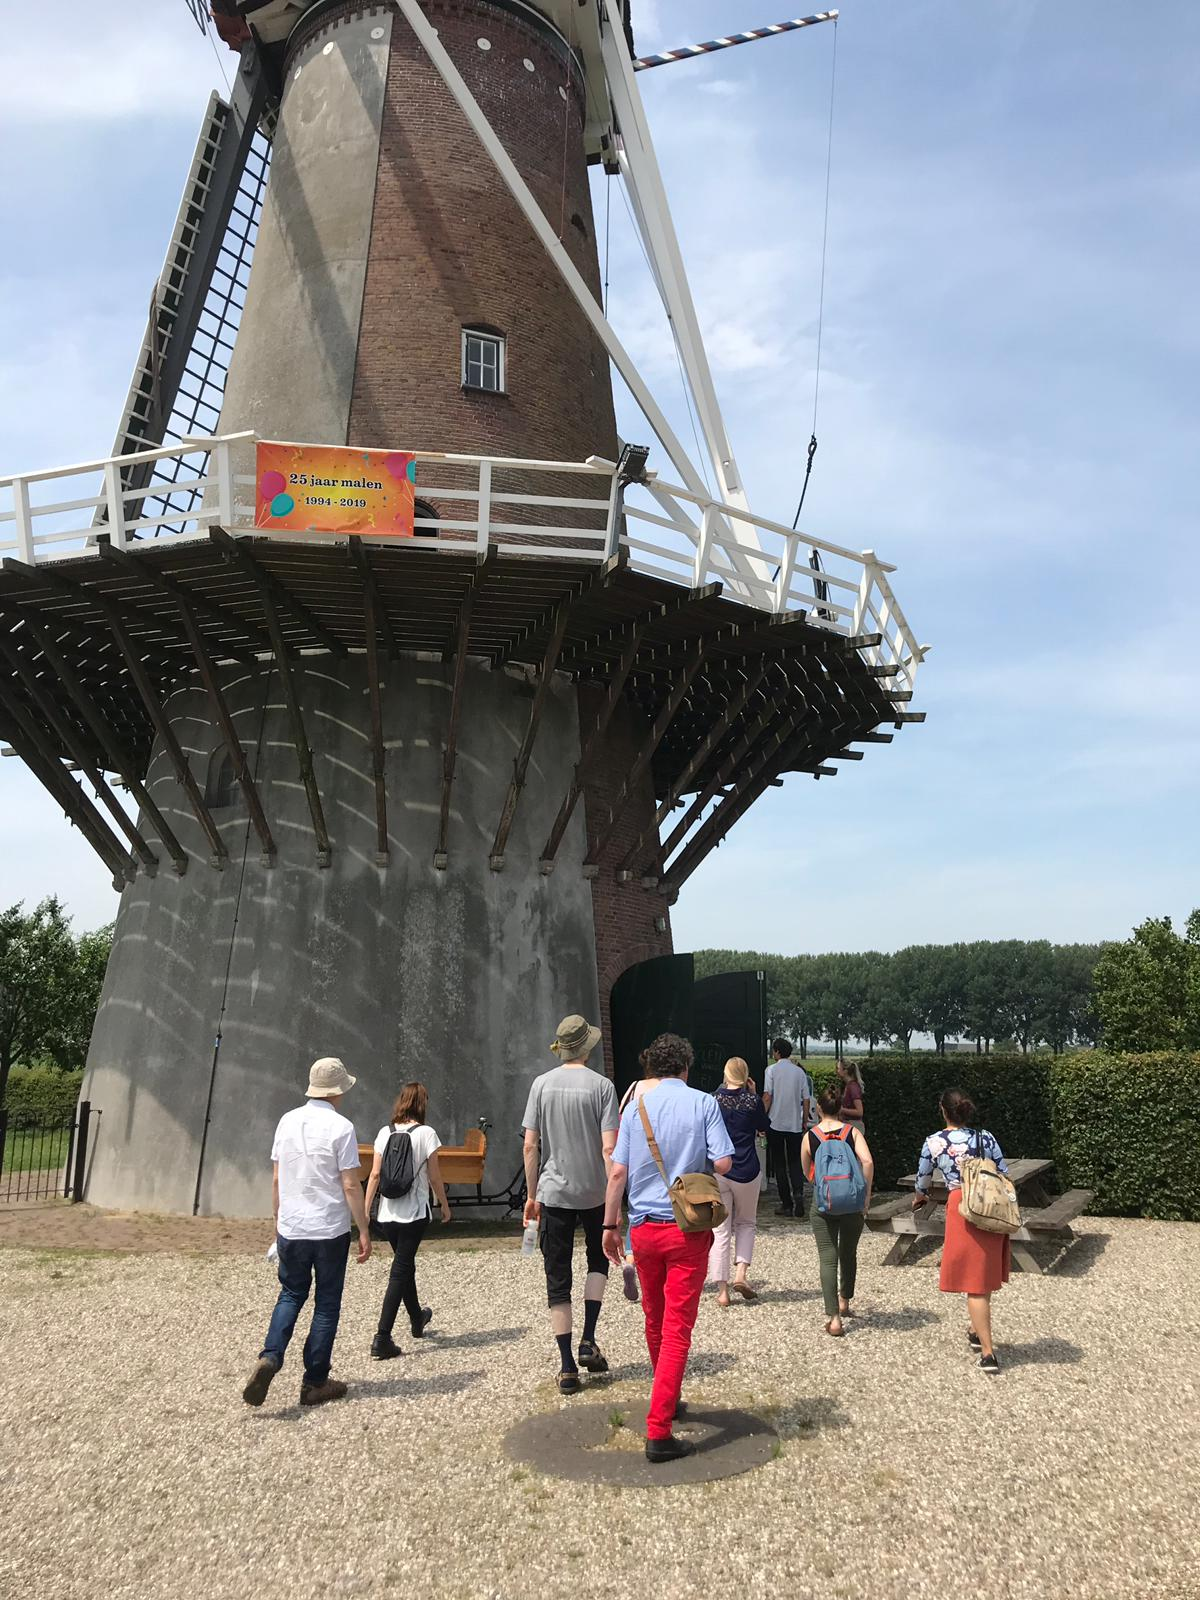 Visit to Utrechtse Heuvelrug regions